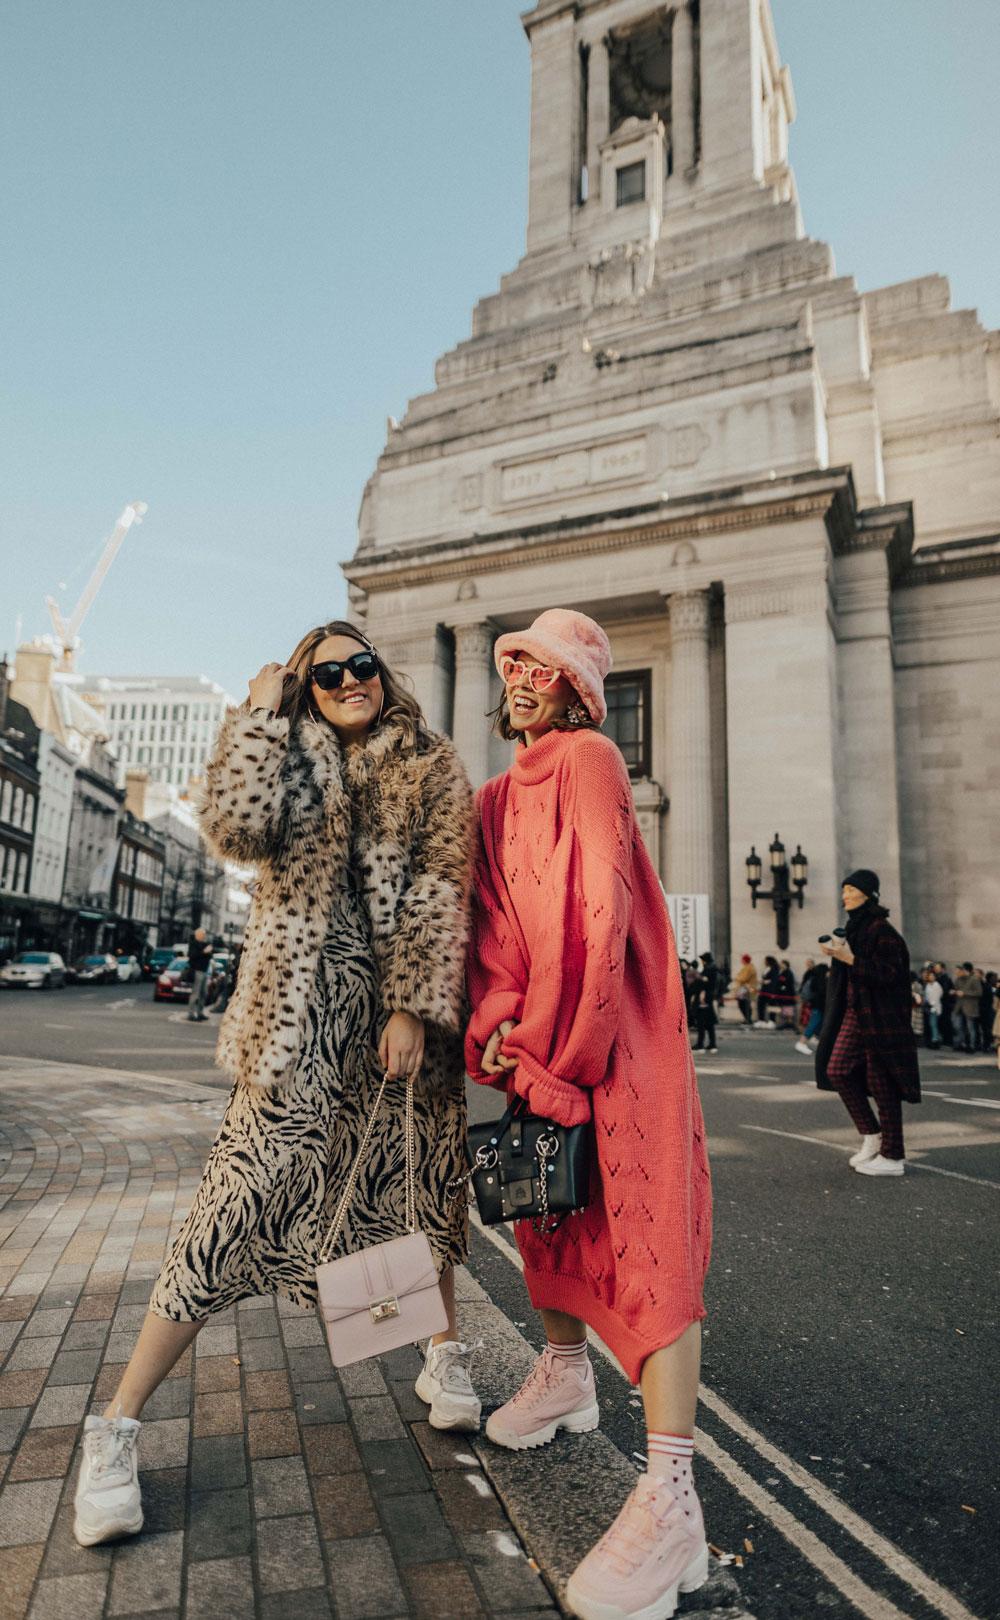 london-fashion-week-aw19-92.jpg